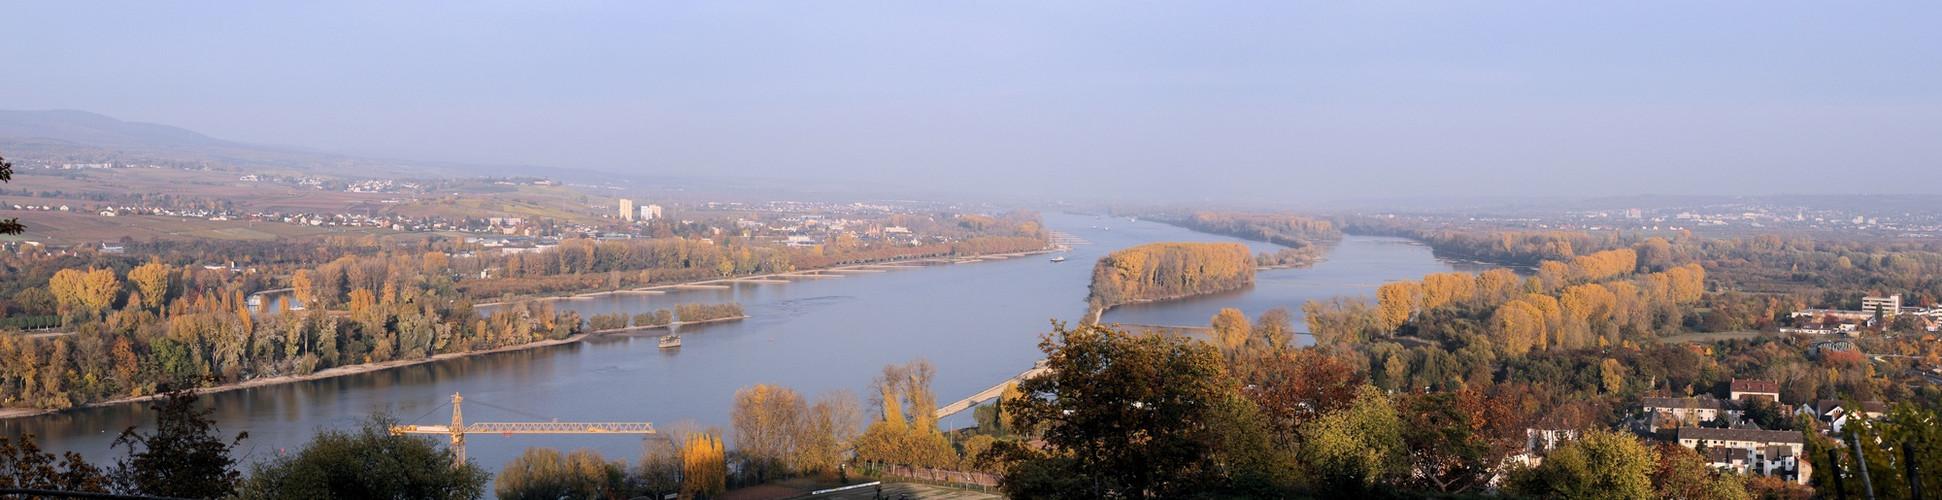 Rochusberg in Richtung Mainz